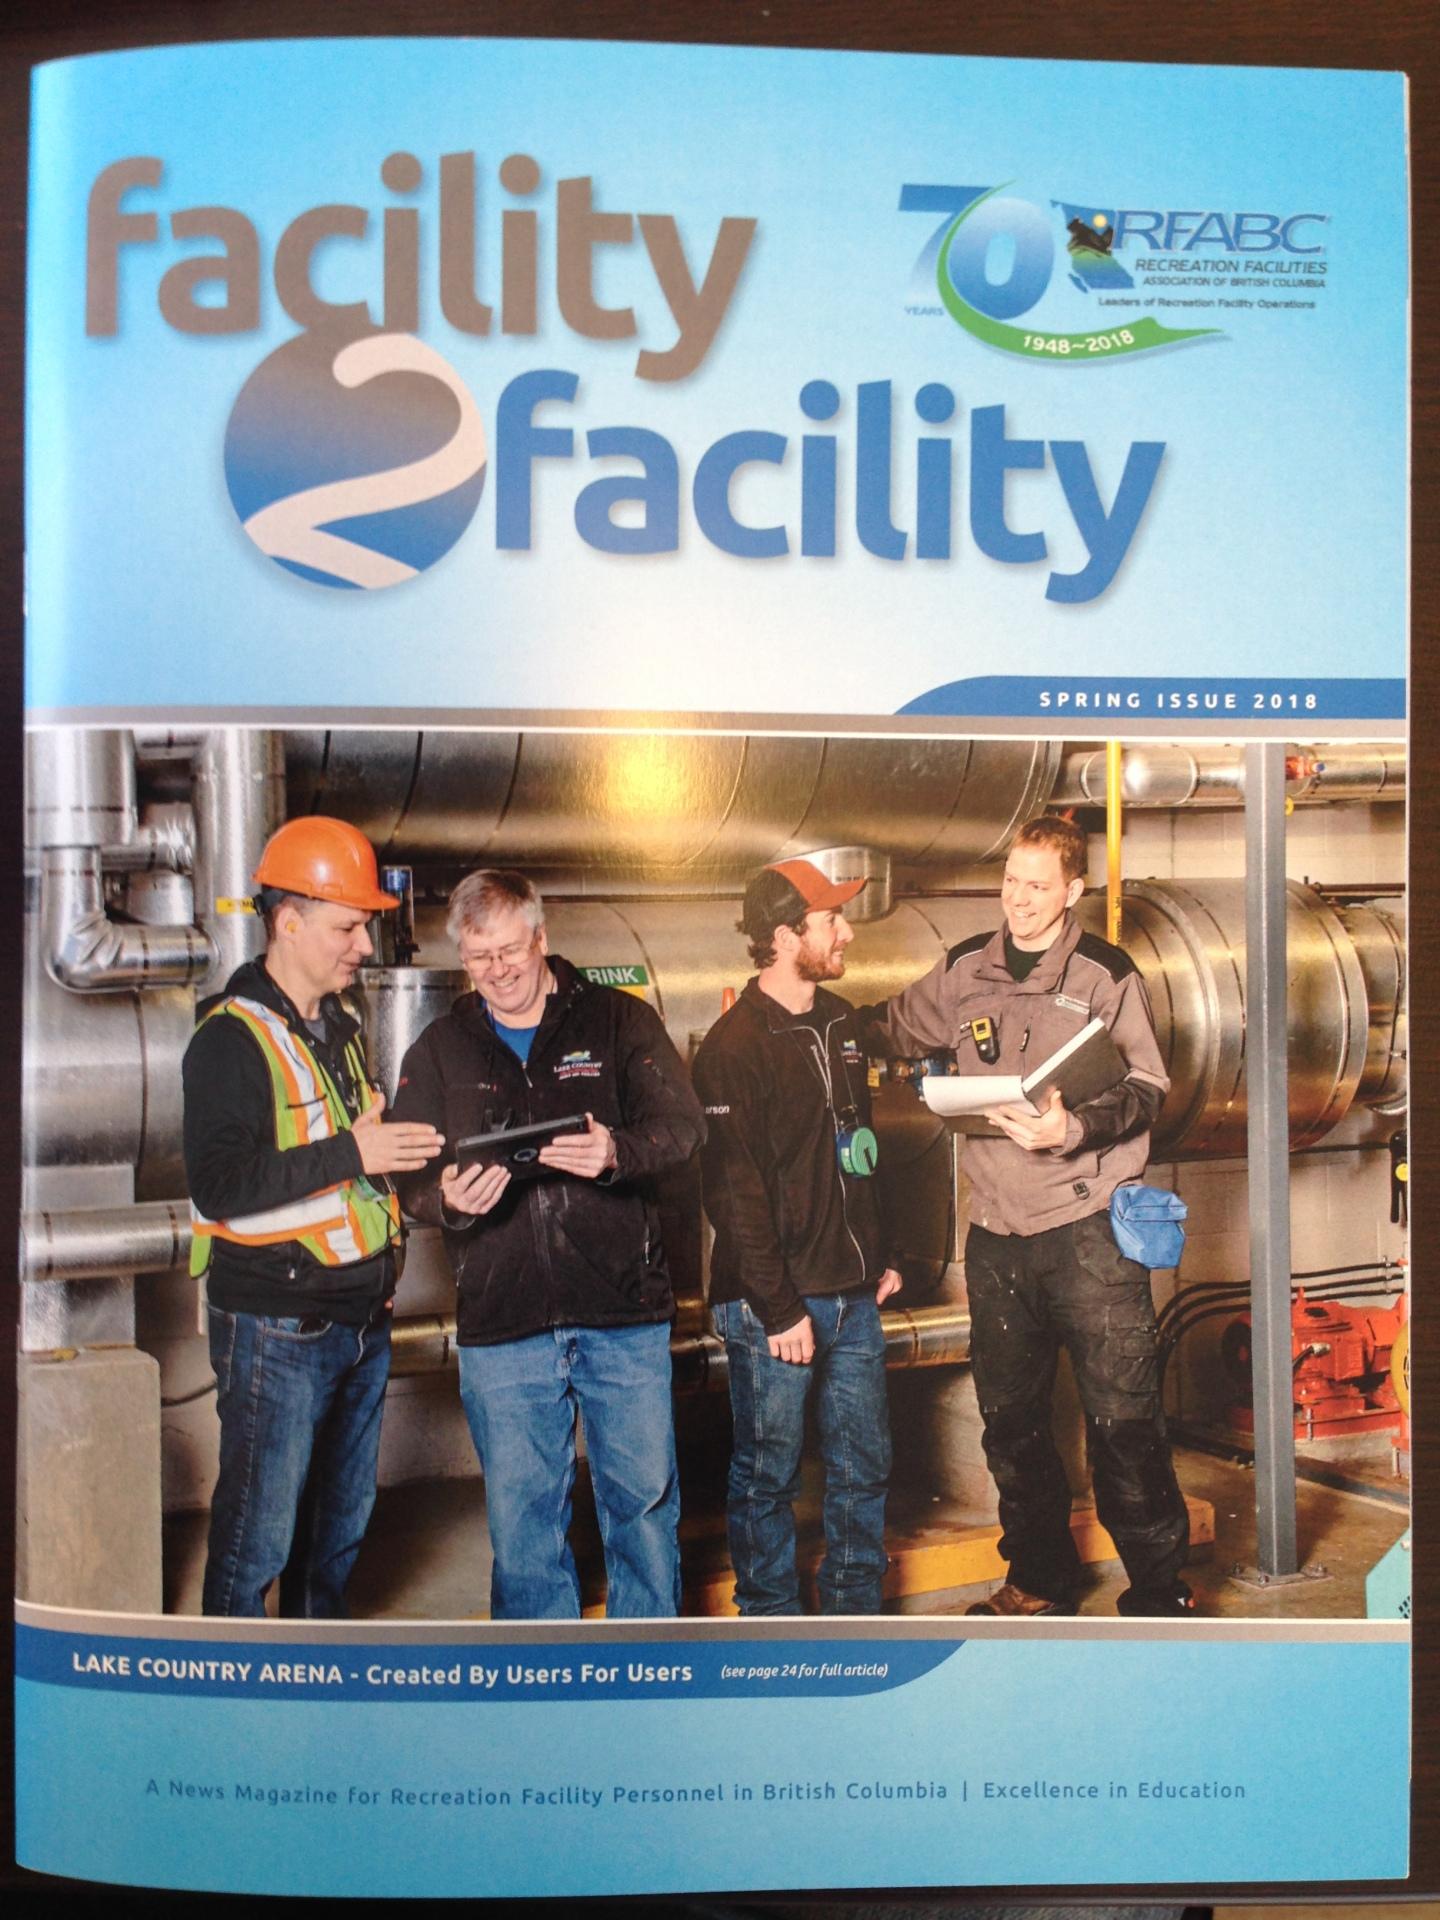 RFABC F2F Spring Magazine